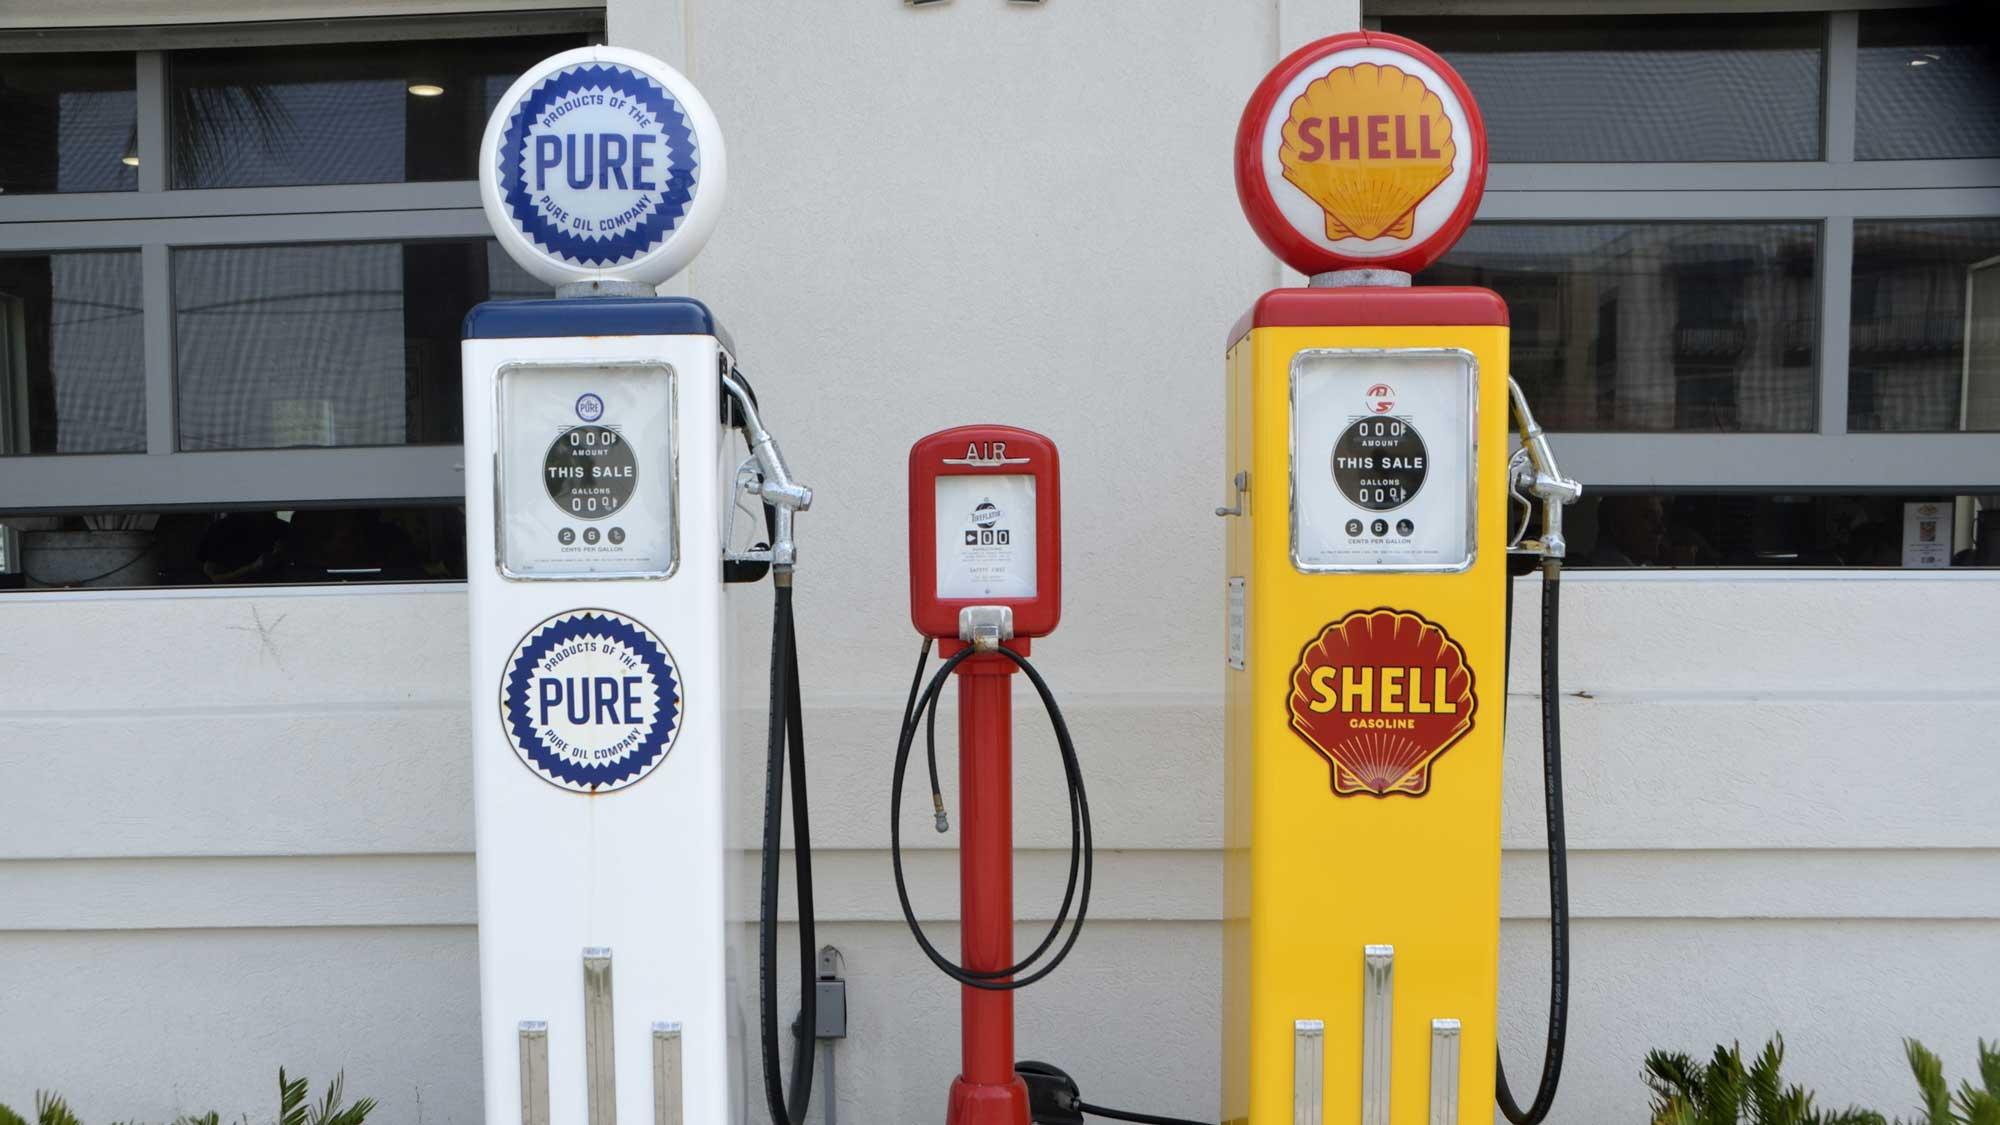 Vintage oil pump in gas station